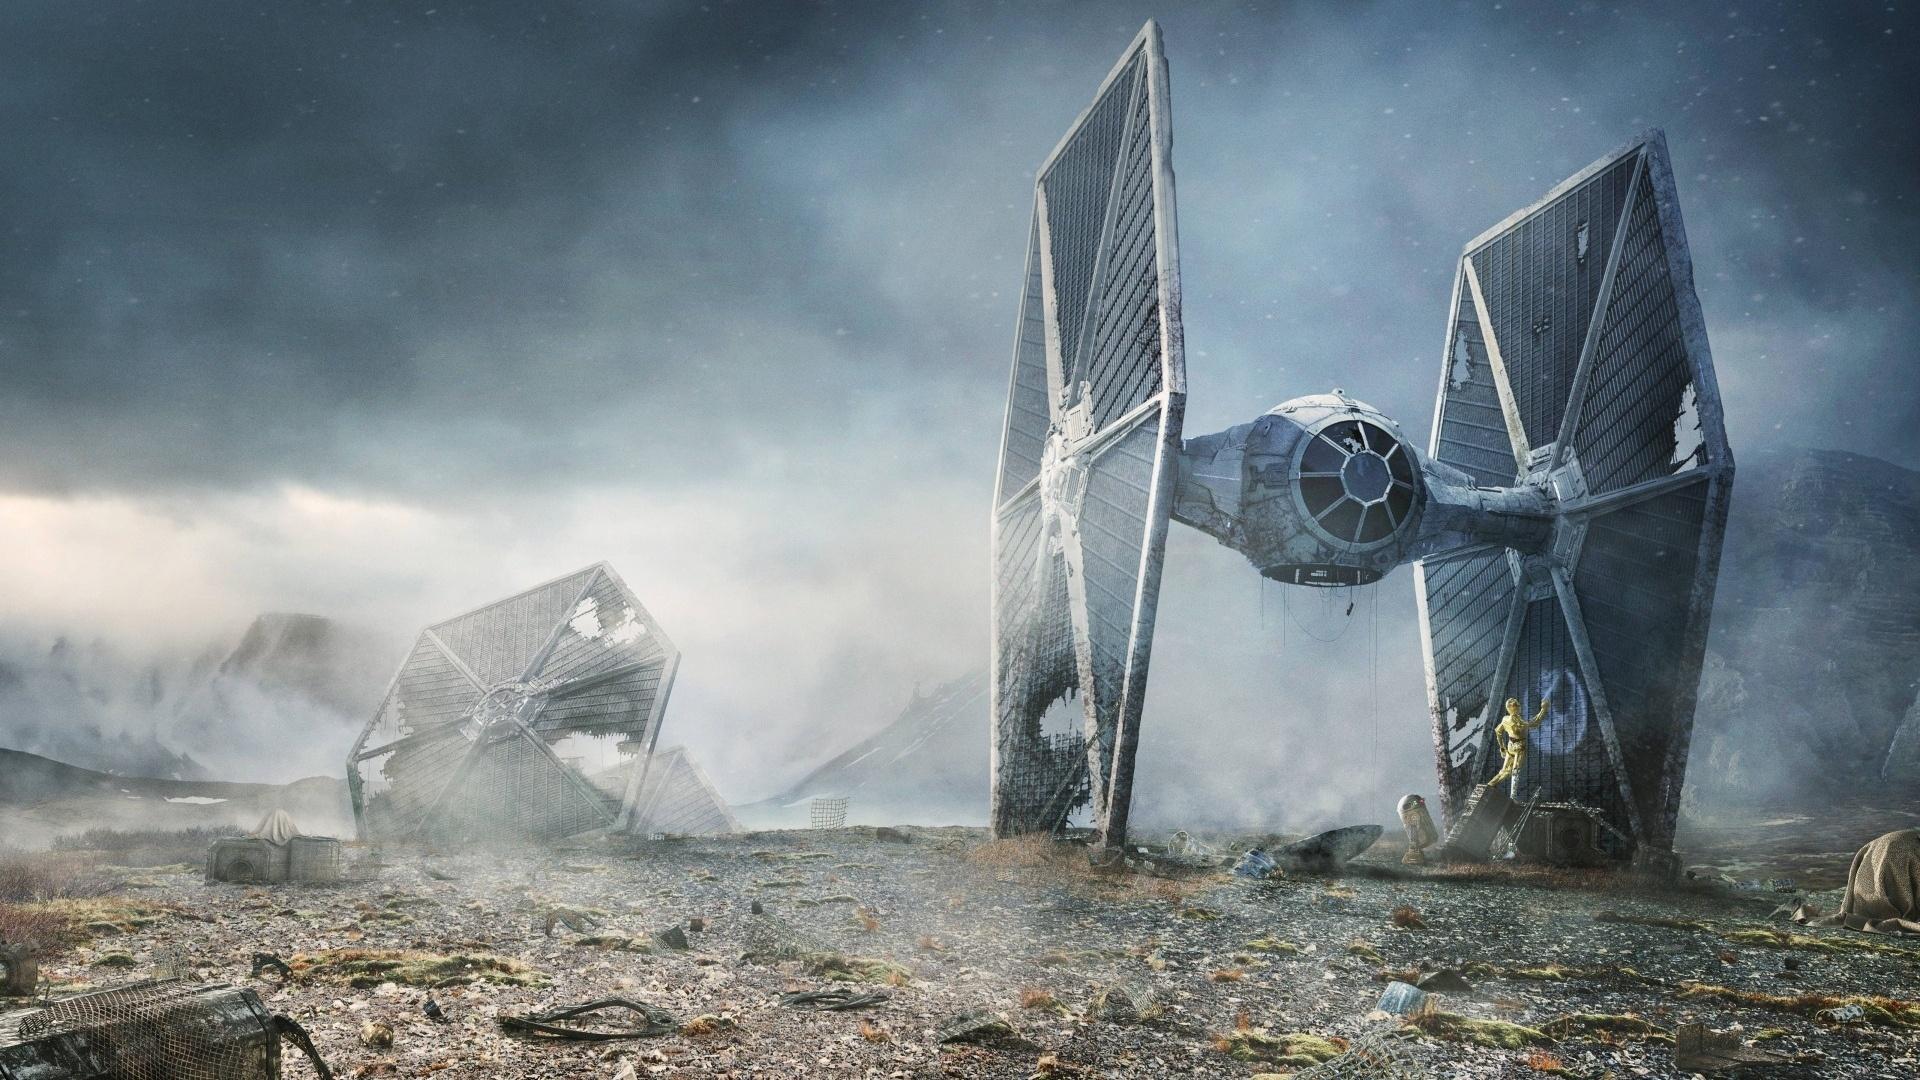 Star Wars computer wallpaper